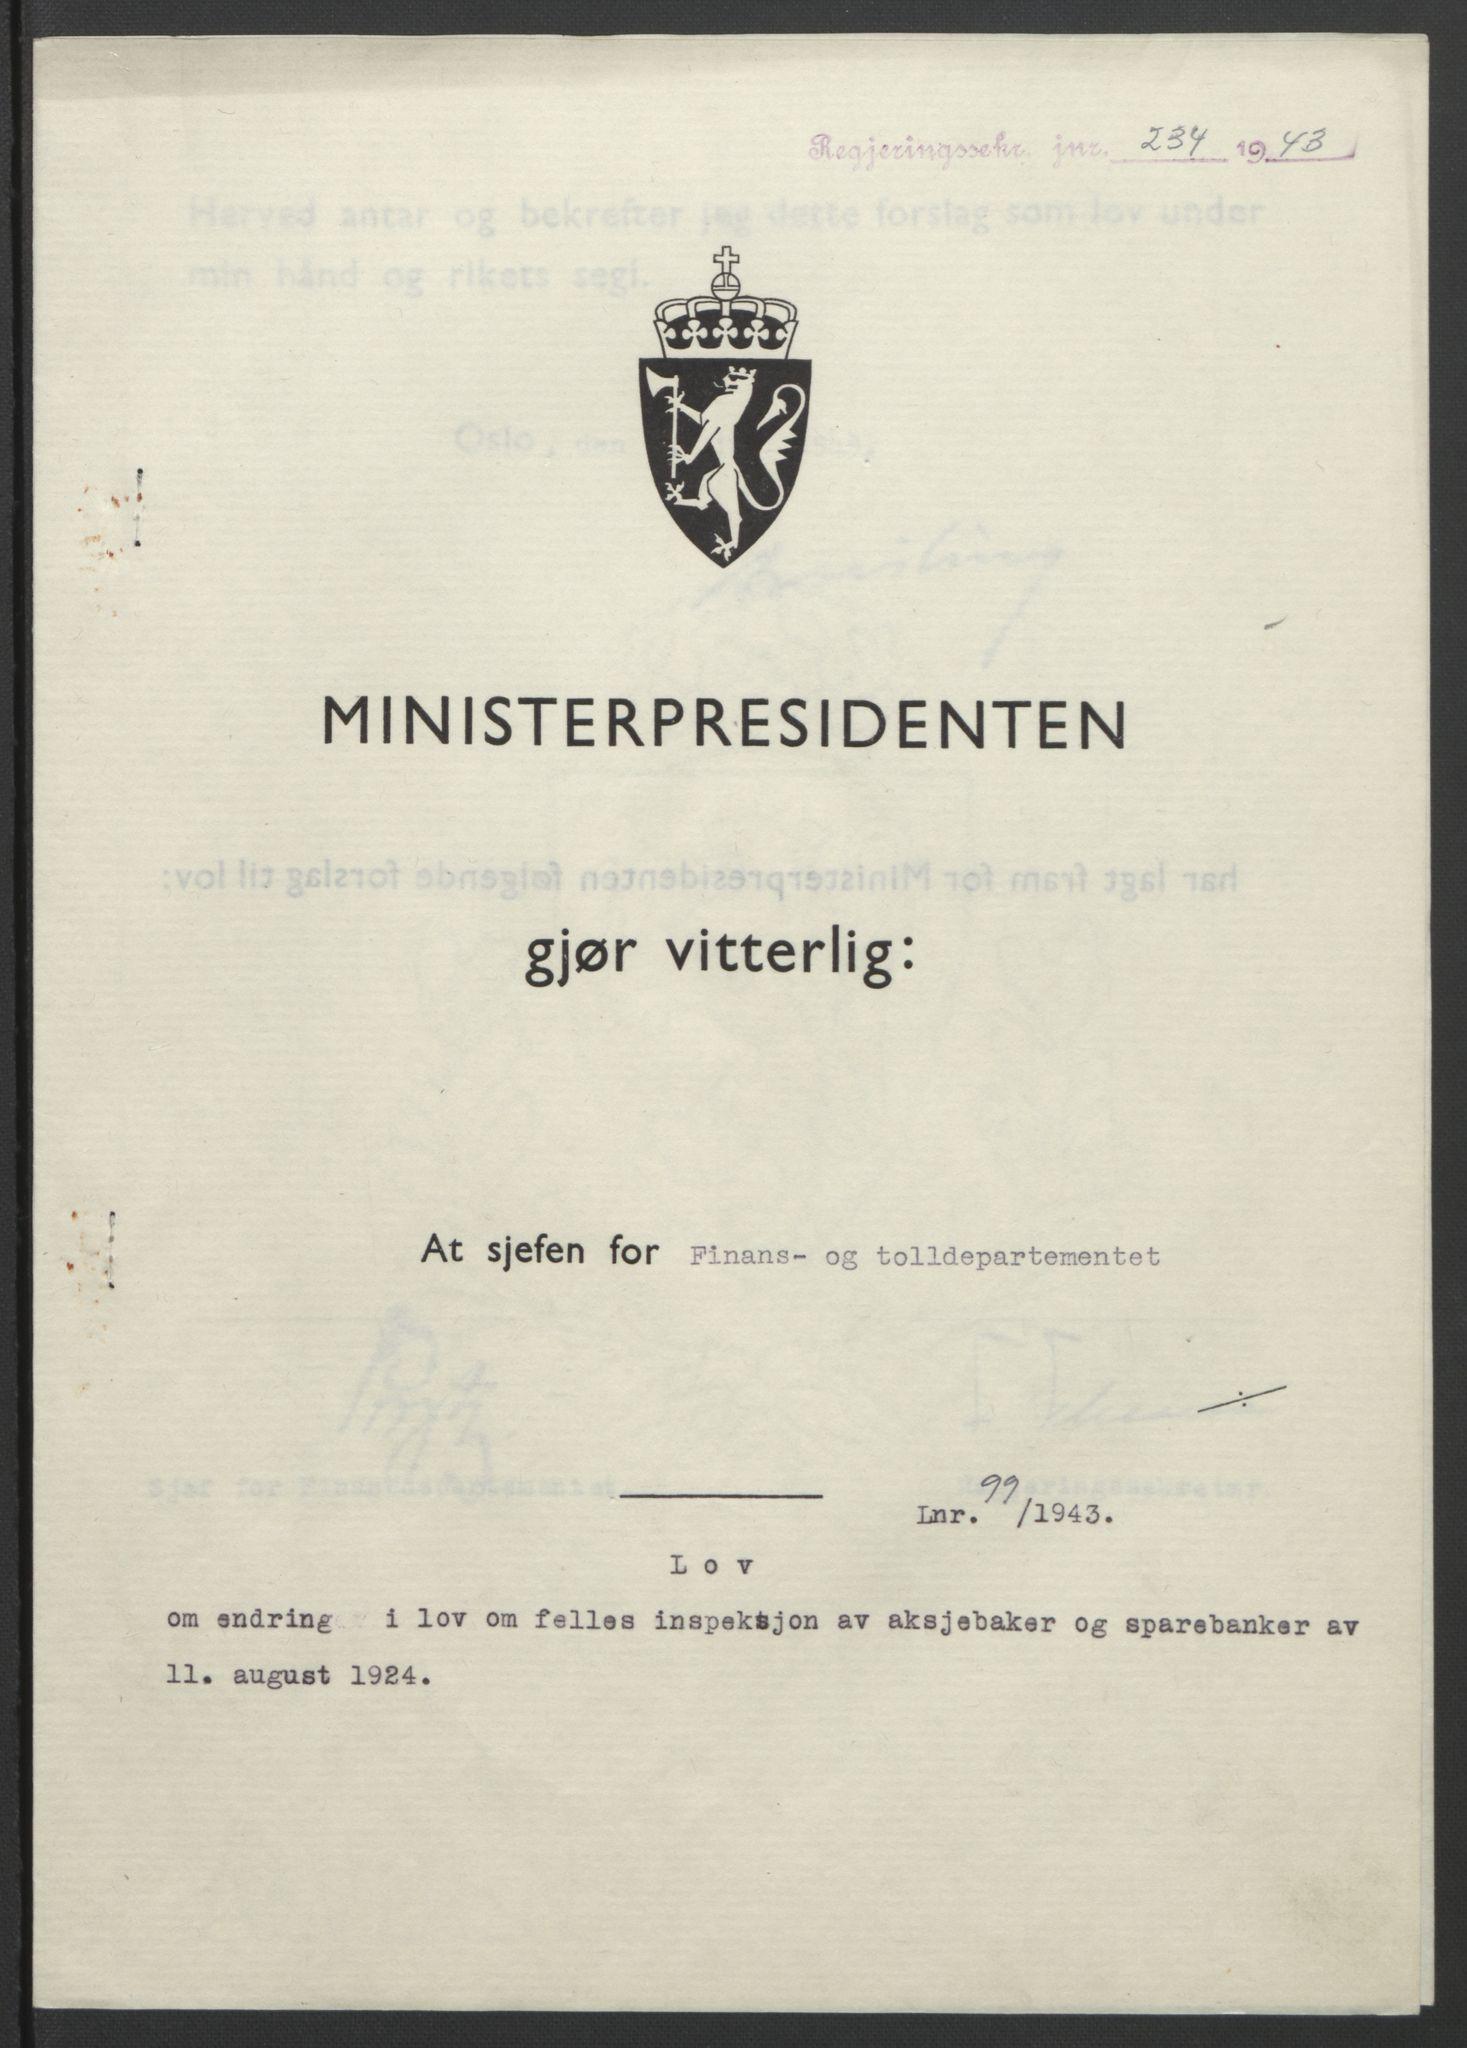 RA, NS-administrasjonen 1940-1945 (Statsrådsekretariatet, de kommisariske statsråder mm), D/Db/L0099: Lover, 1943, s. 452